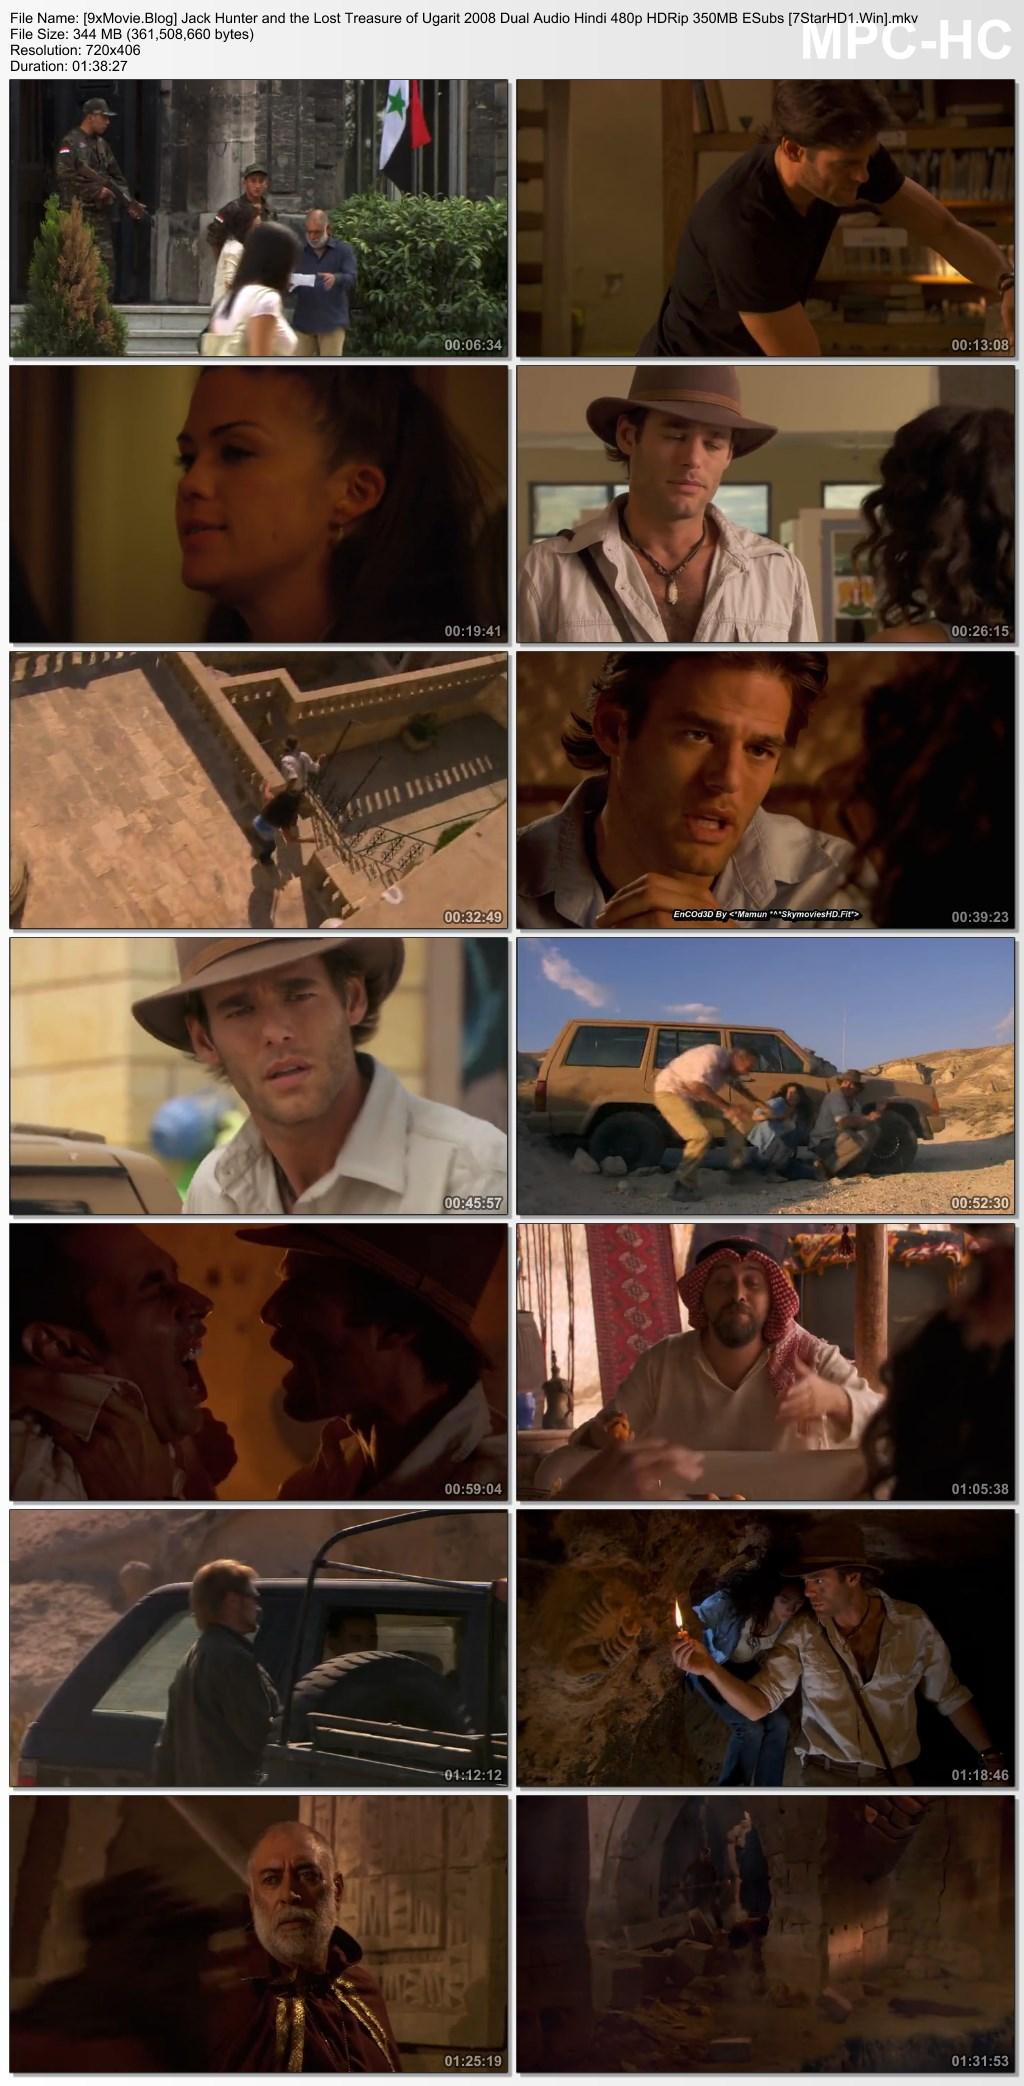 Jack Hunter and the Lost Treasure of Ugarit 2008 Dual Audio Hindi 480p HDRip x264 350MB ESubs